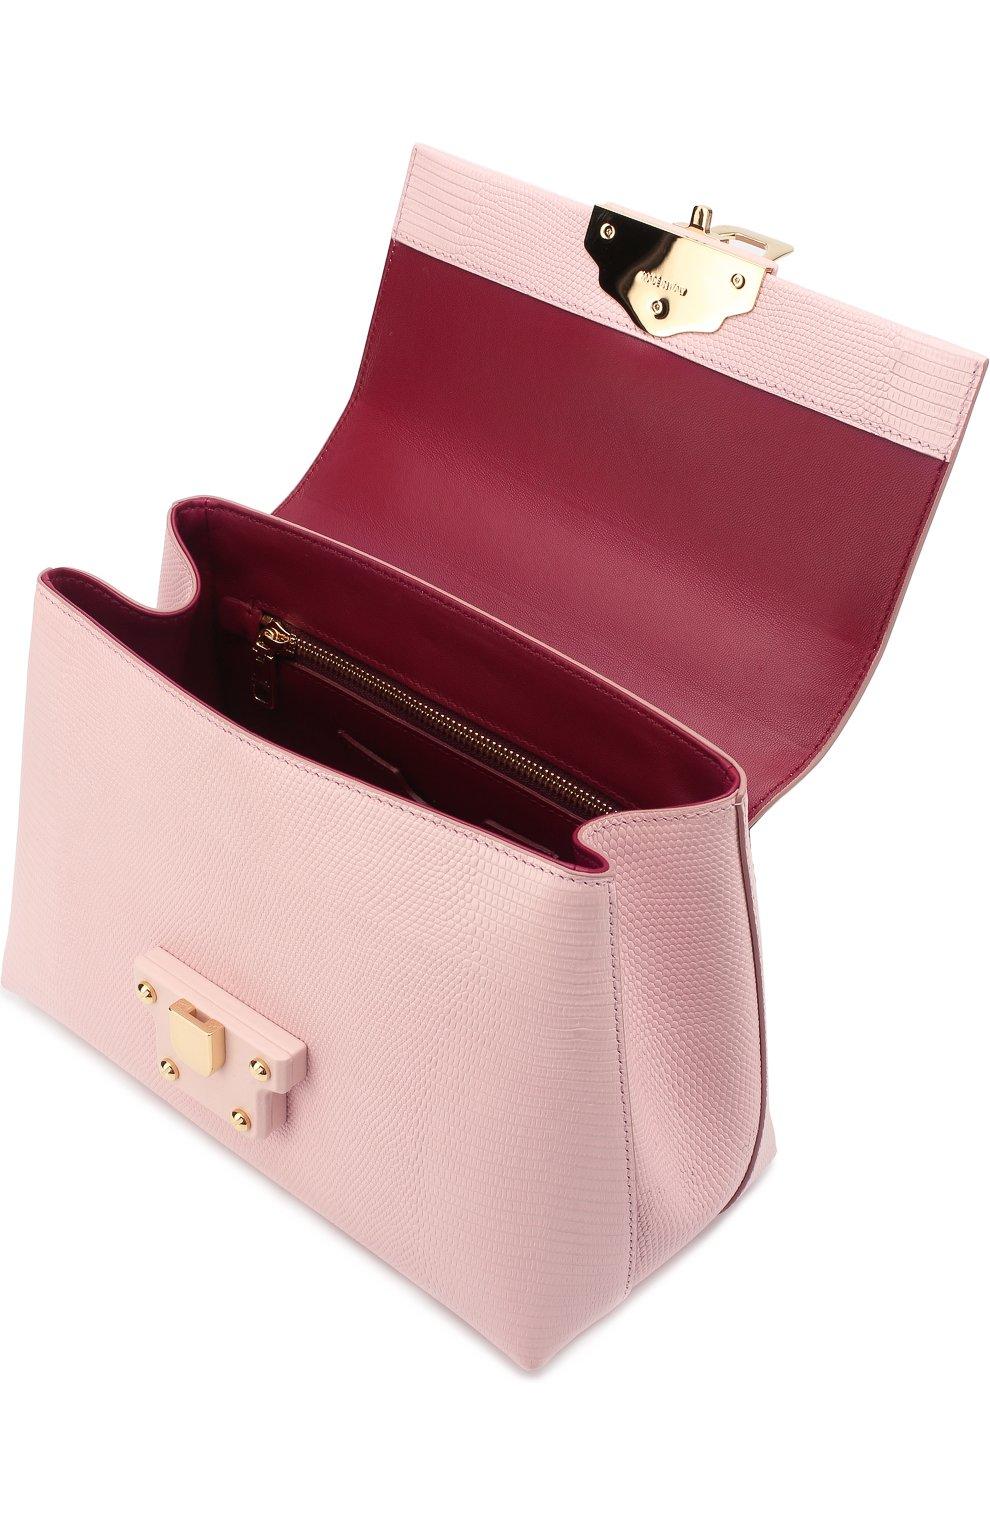 Сумка Lucia из тисненой кожи Dolce & Gabbana светло-розовая цвета | Фото №4